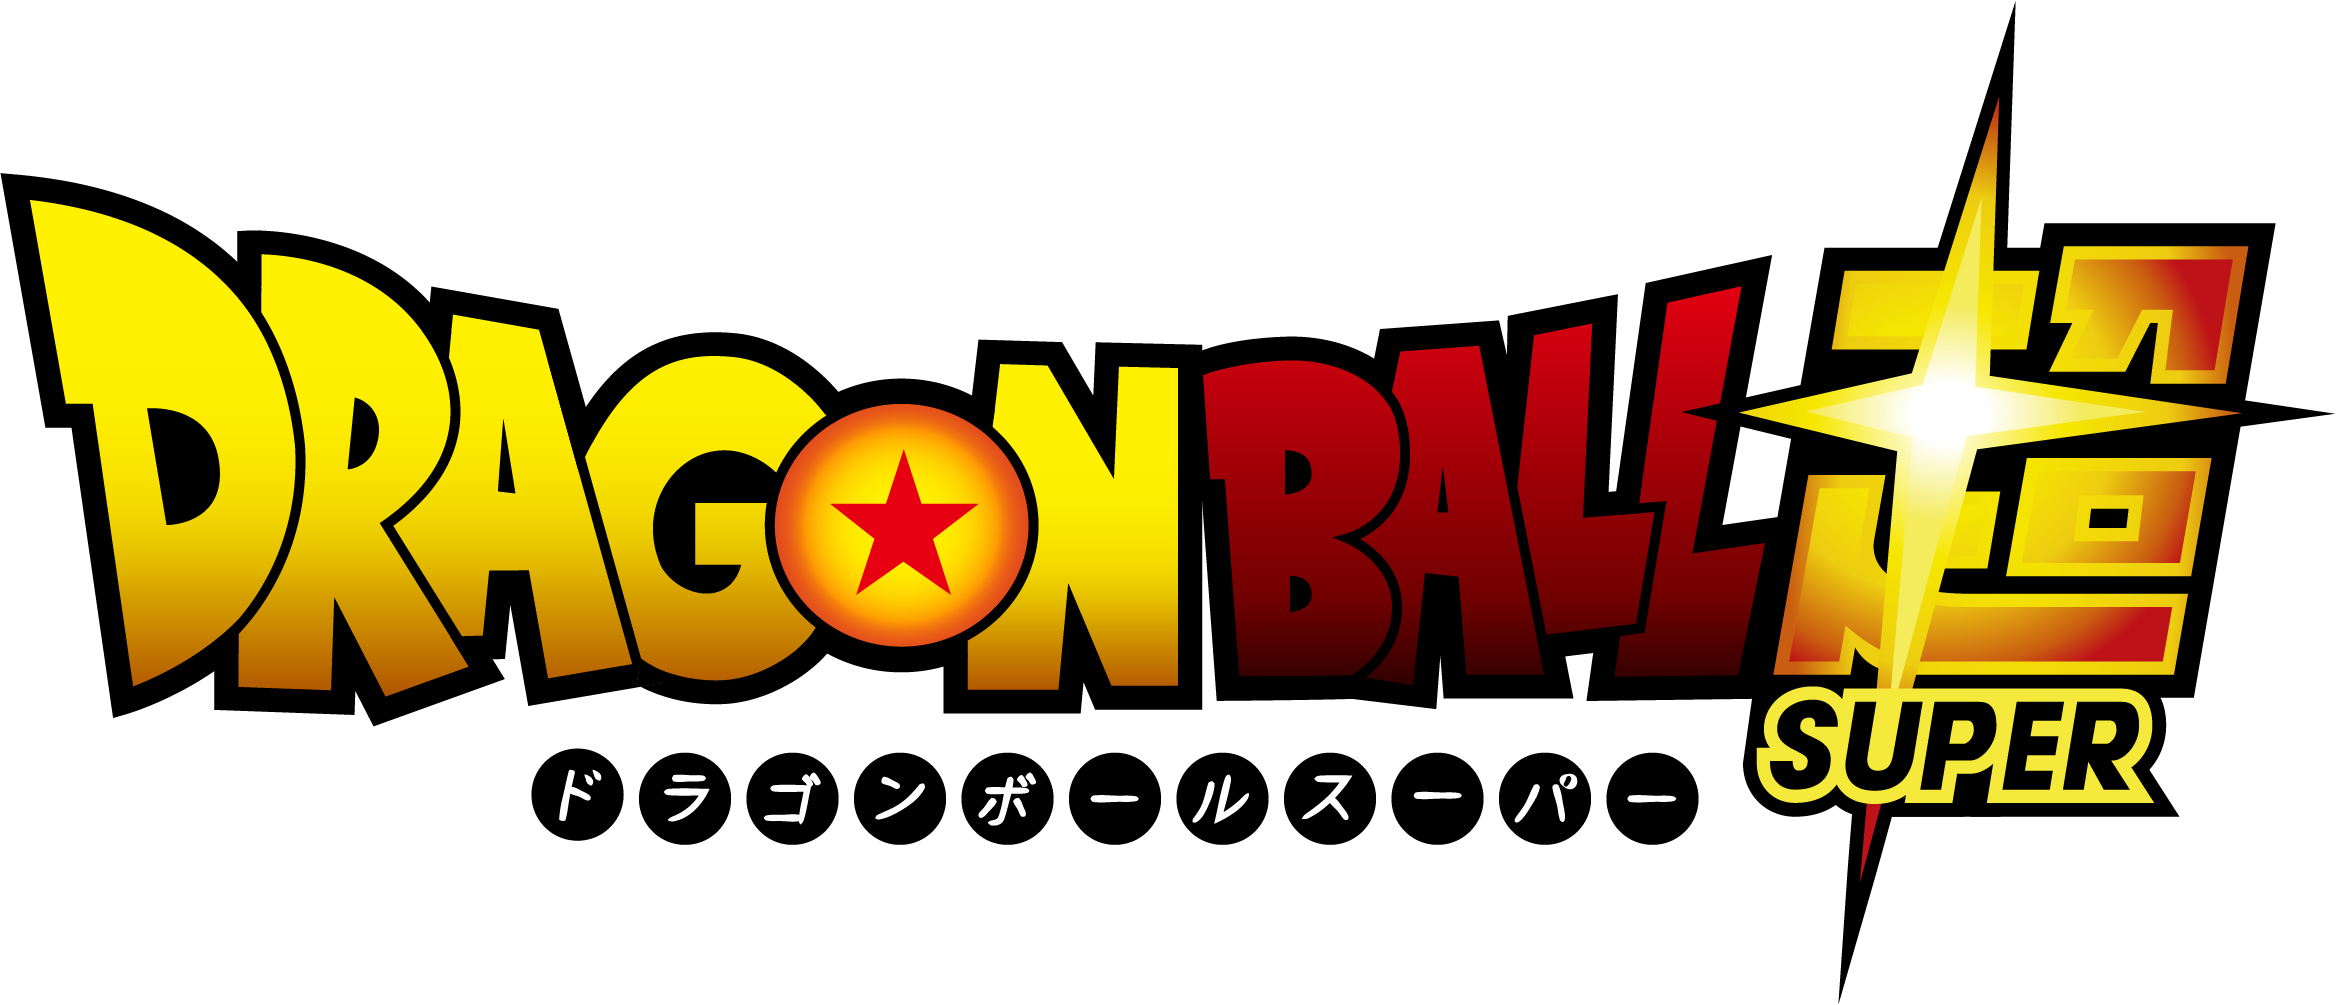 2019 的 Hola, aca dejo el logo de Dragon Ball Super con.